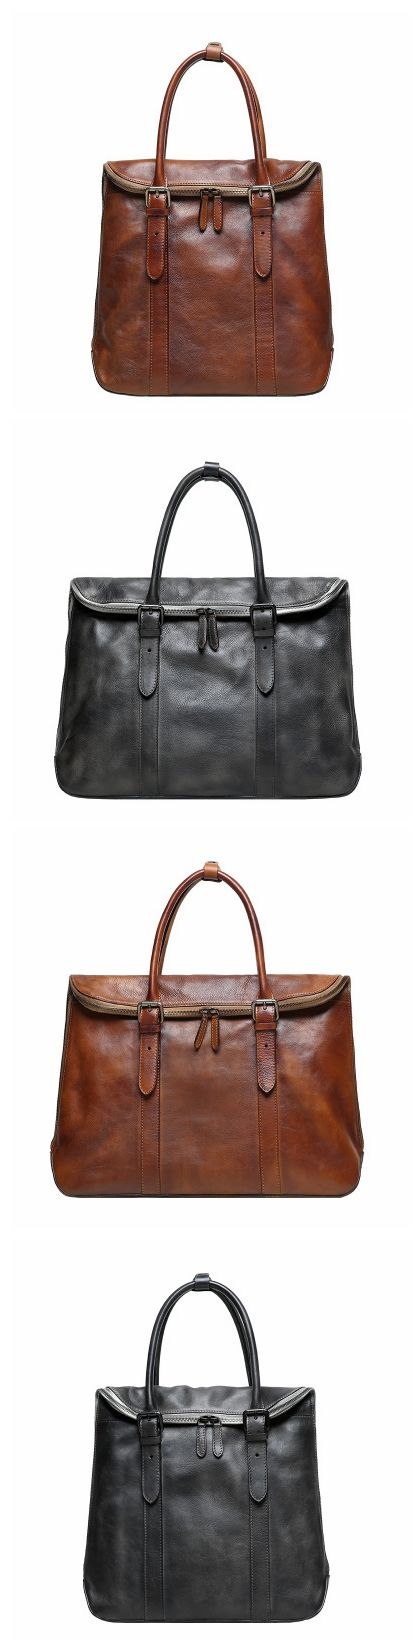 ce1986749b Handmade Vintage Top Grain Leather Briefcase 14   Leather Laptop Bag Men s  Fashion Business Bag GR01 Overview: Design  Men s Leather Briefcase In  Stock  ...